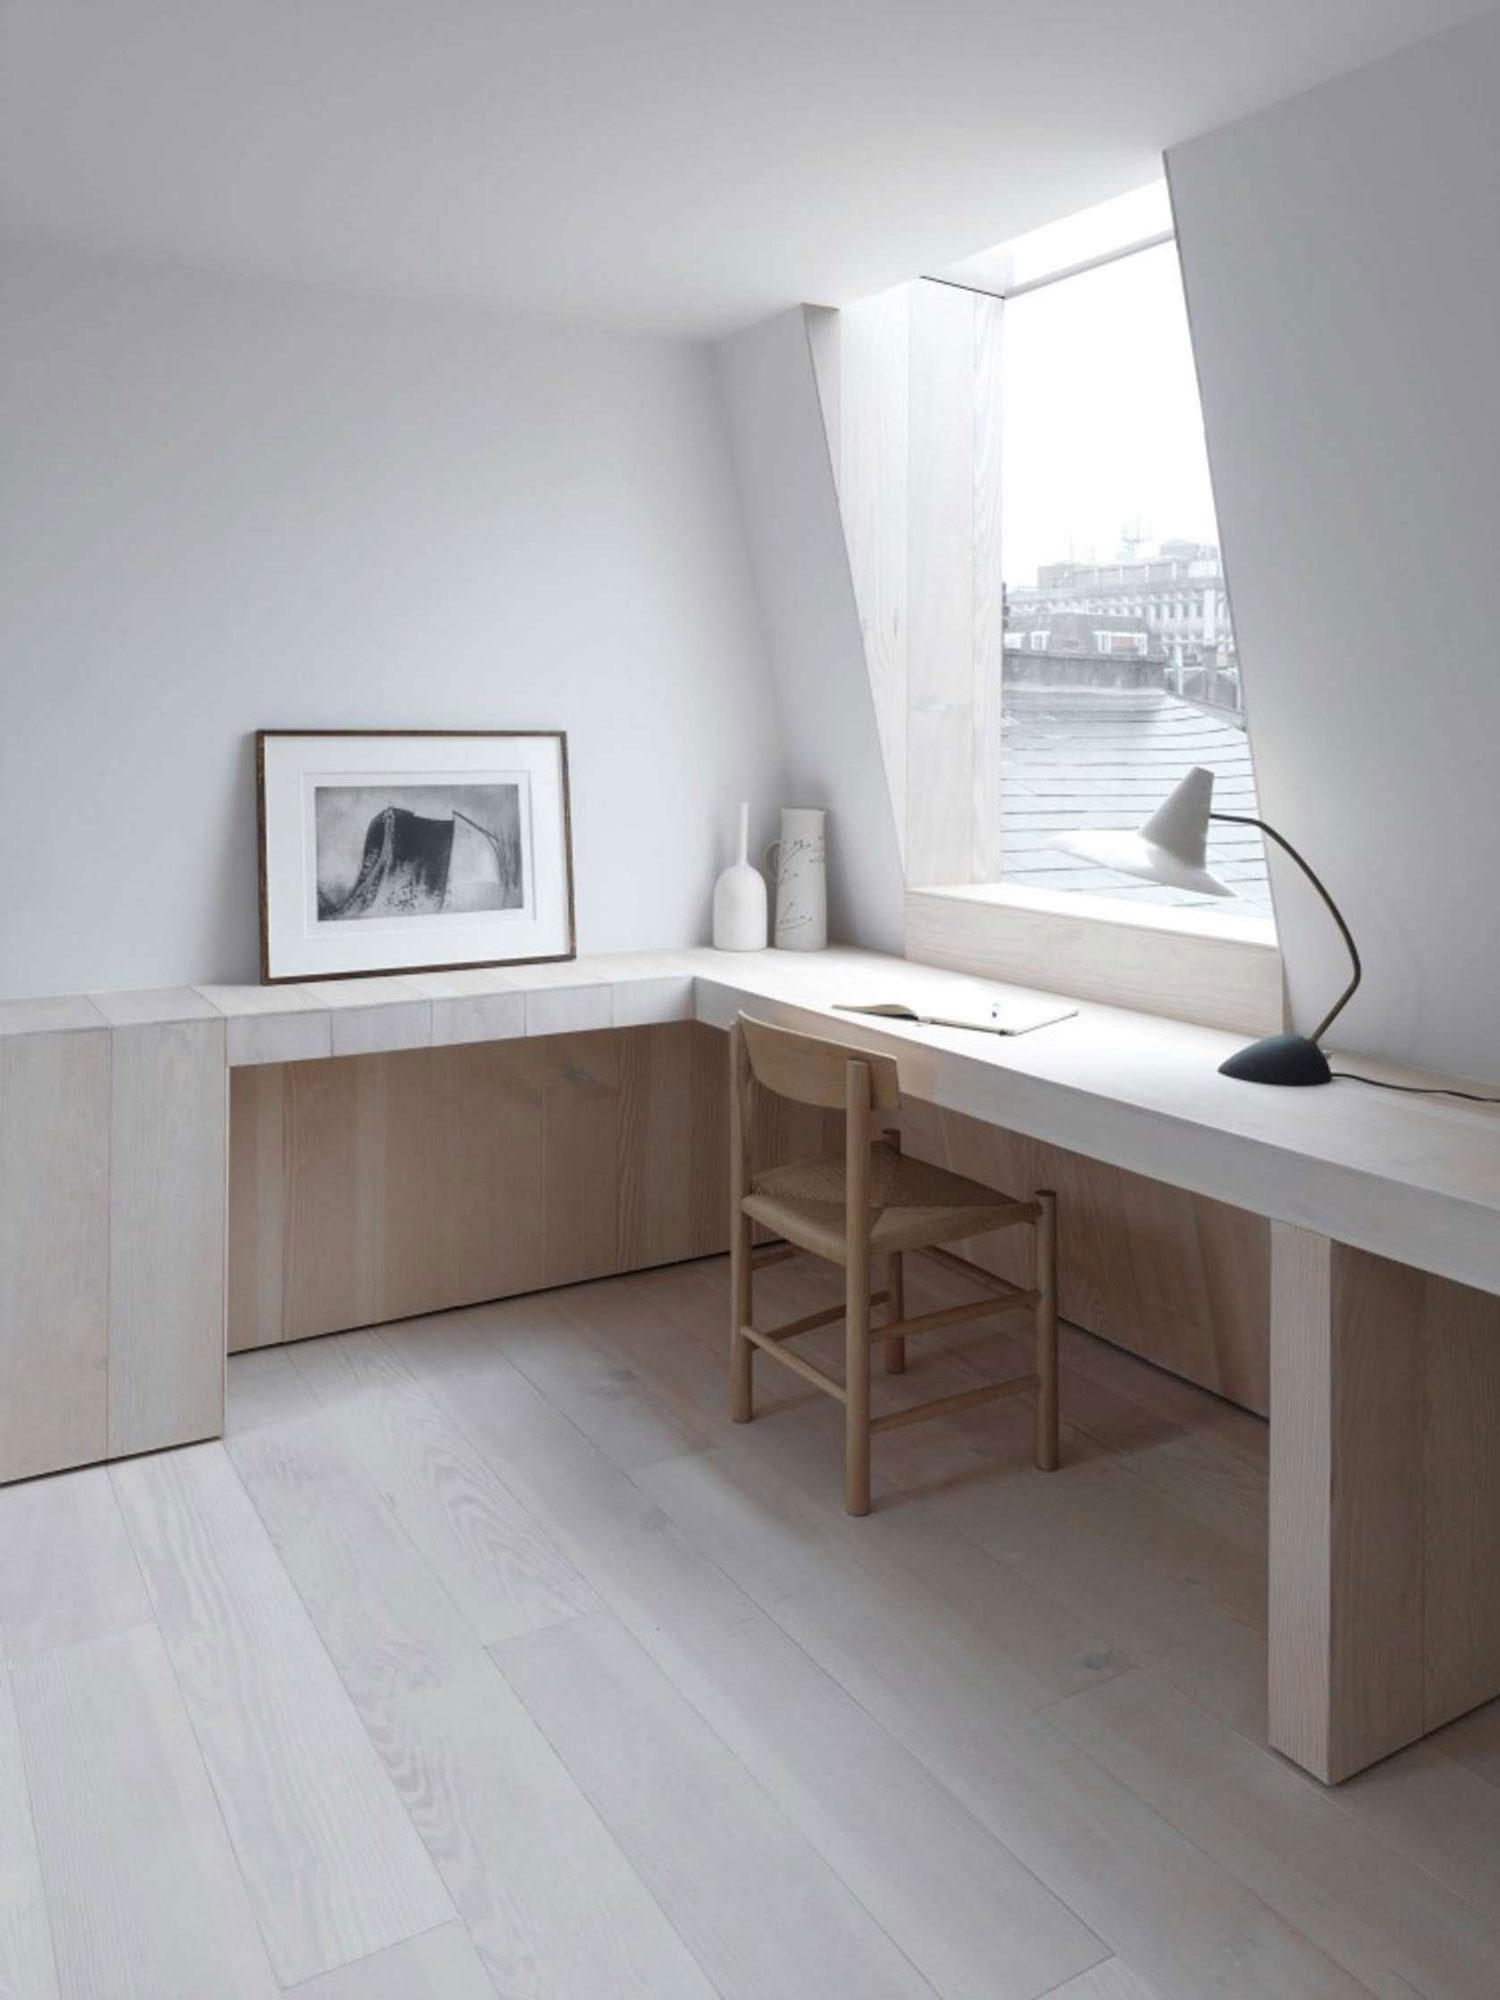 London loft conversion office space inspiration